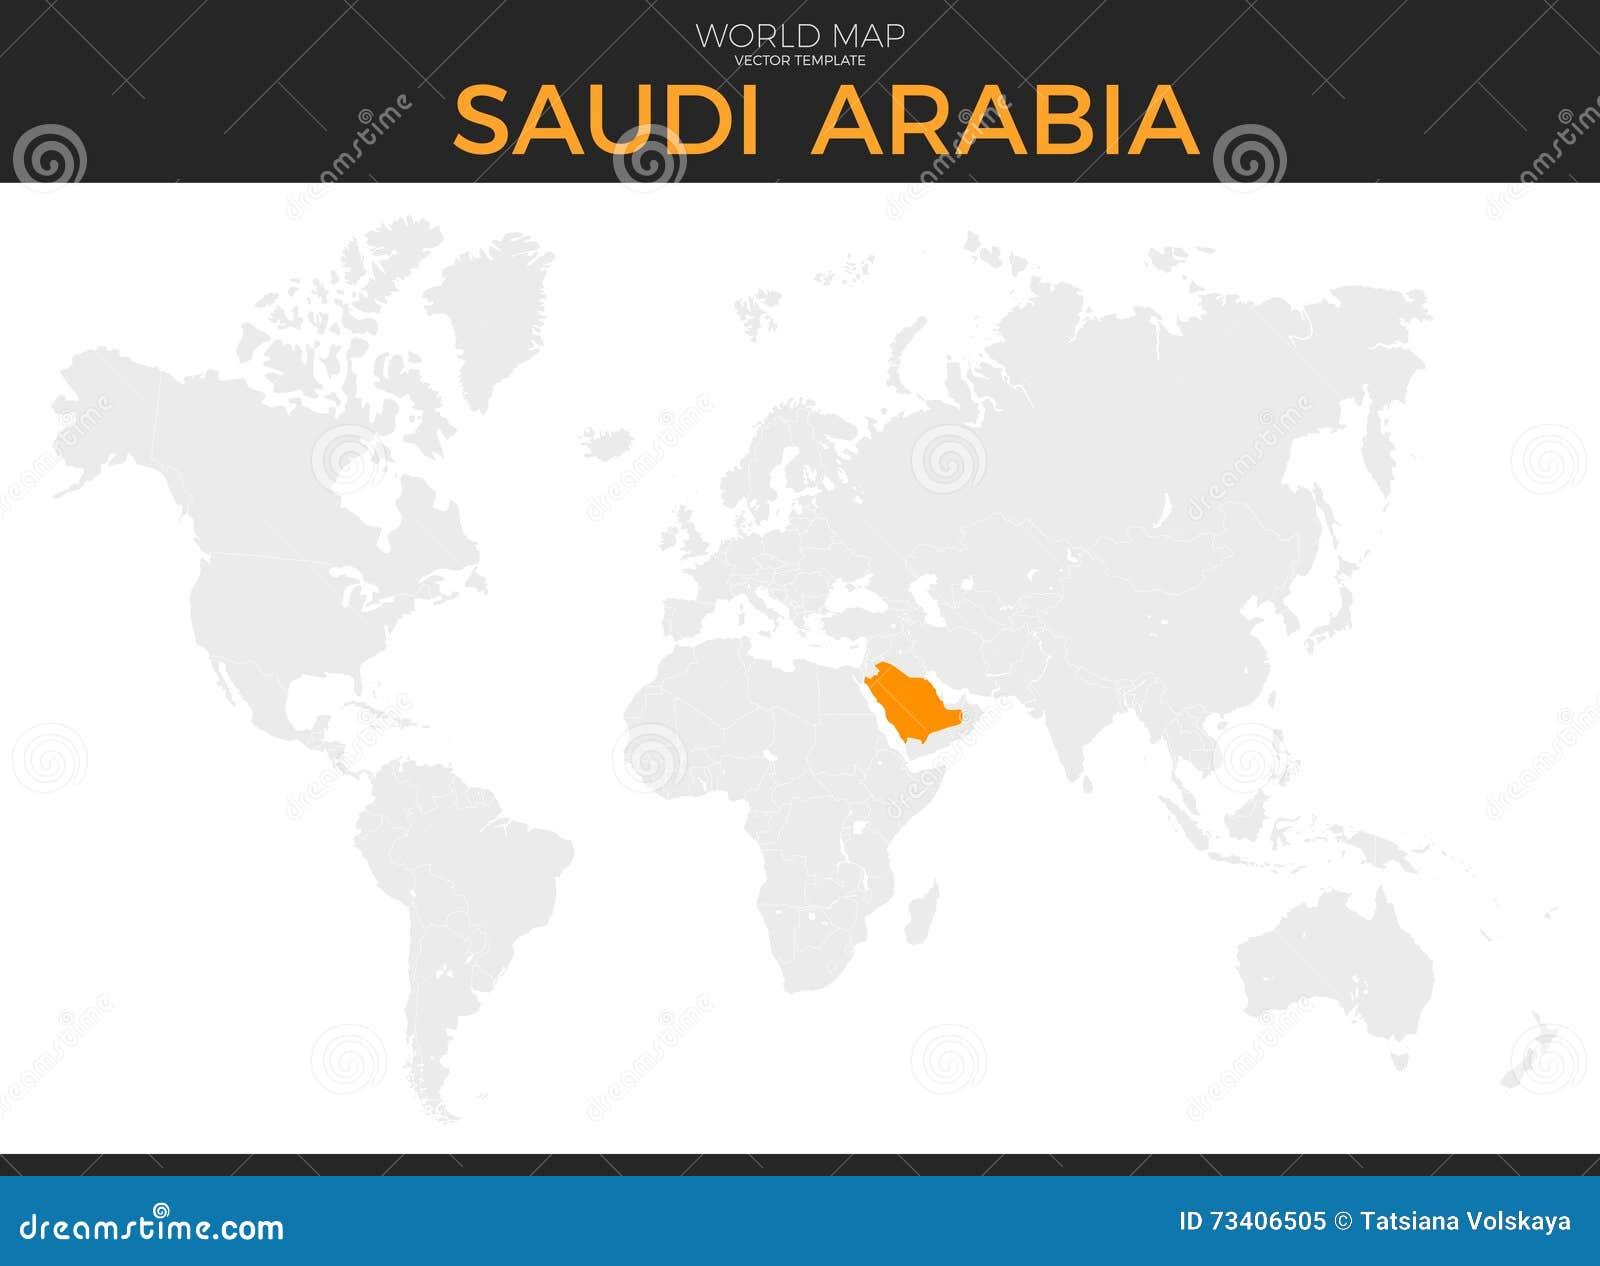 Kingdom Of Saudi Arabia Location Map Illustration 73406505 - Megapixl